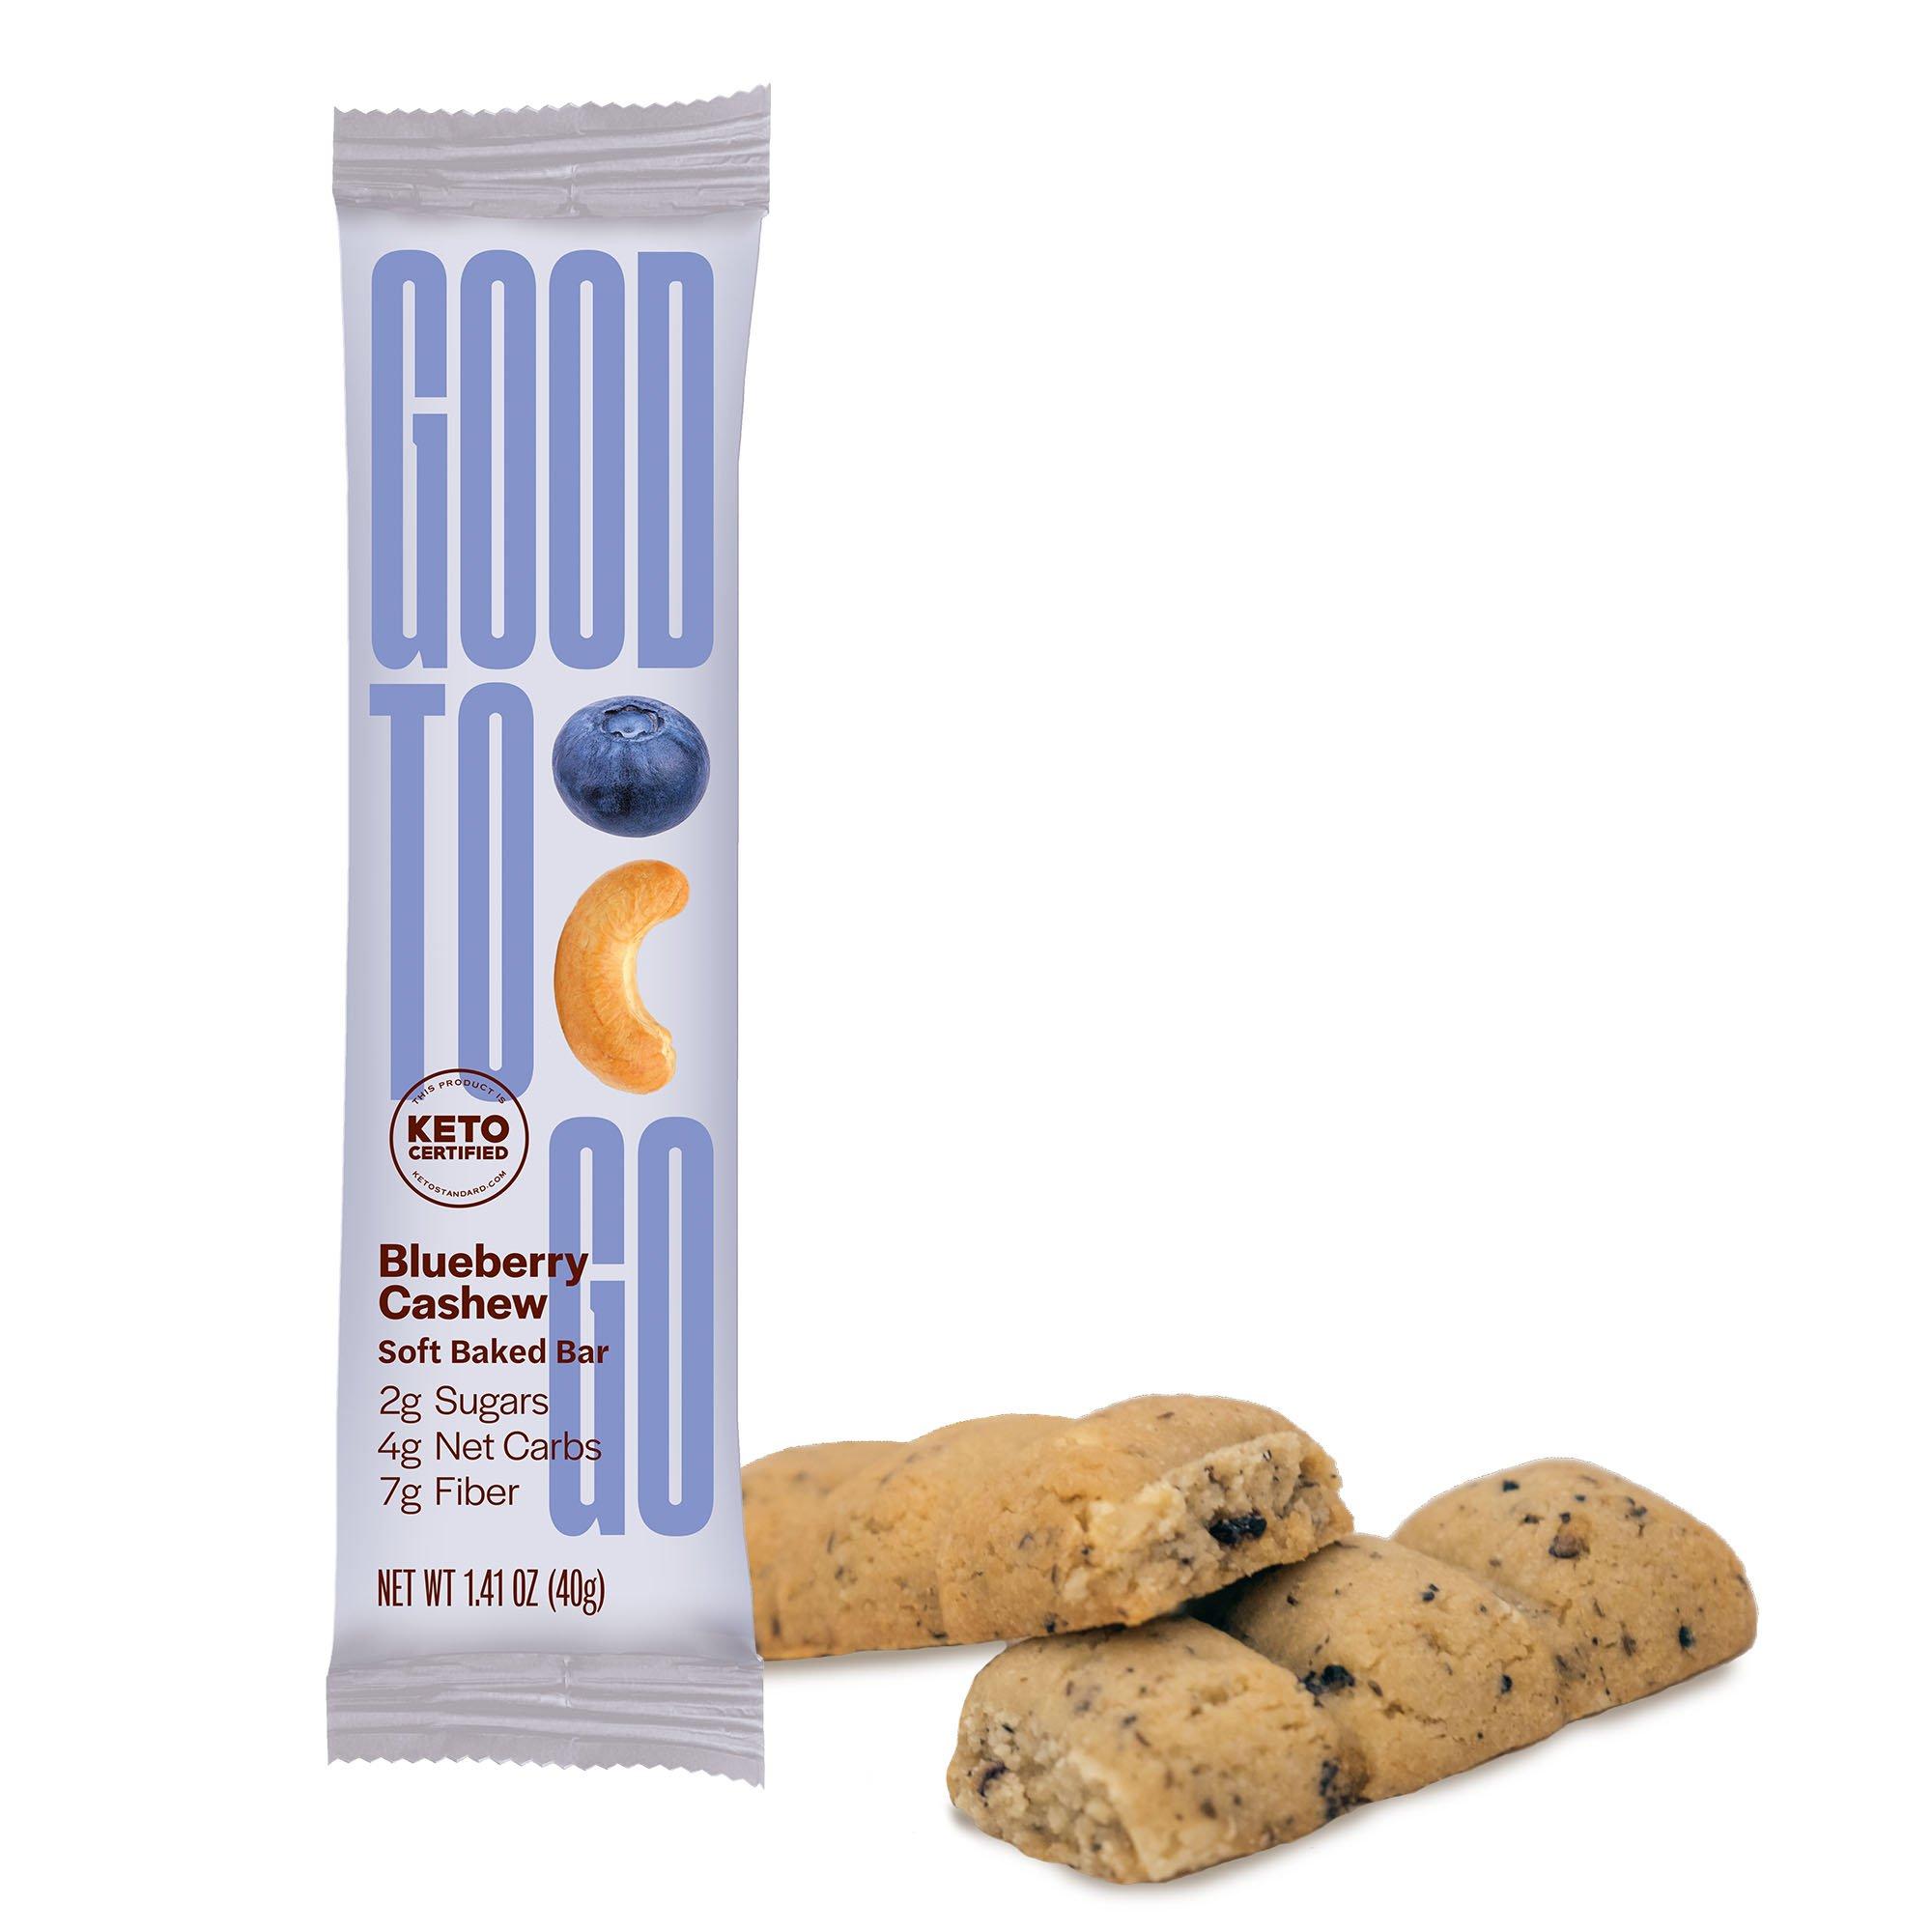 Blueberry Cashew Snack Bar - GoodTo Go Snacks - KETO Certified by the Paleo Foundation